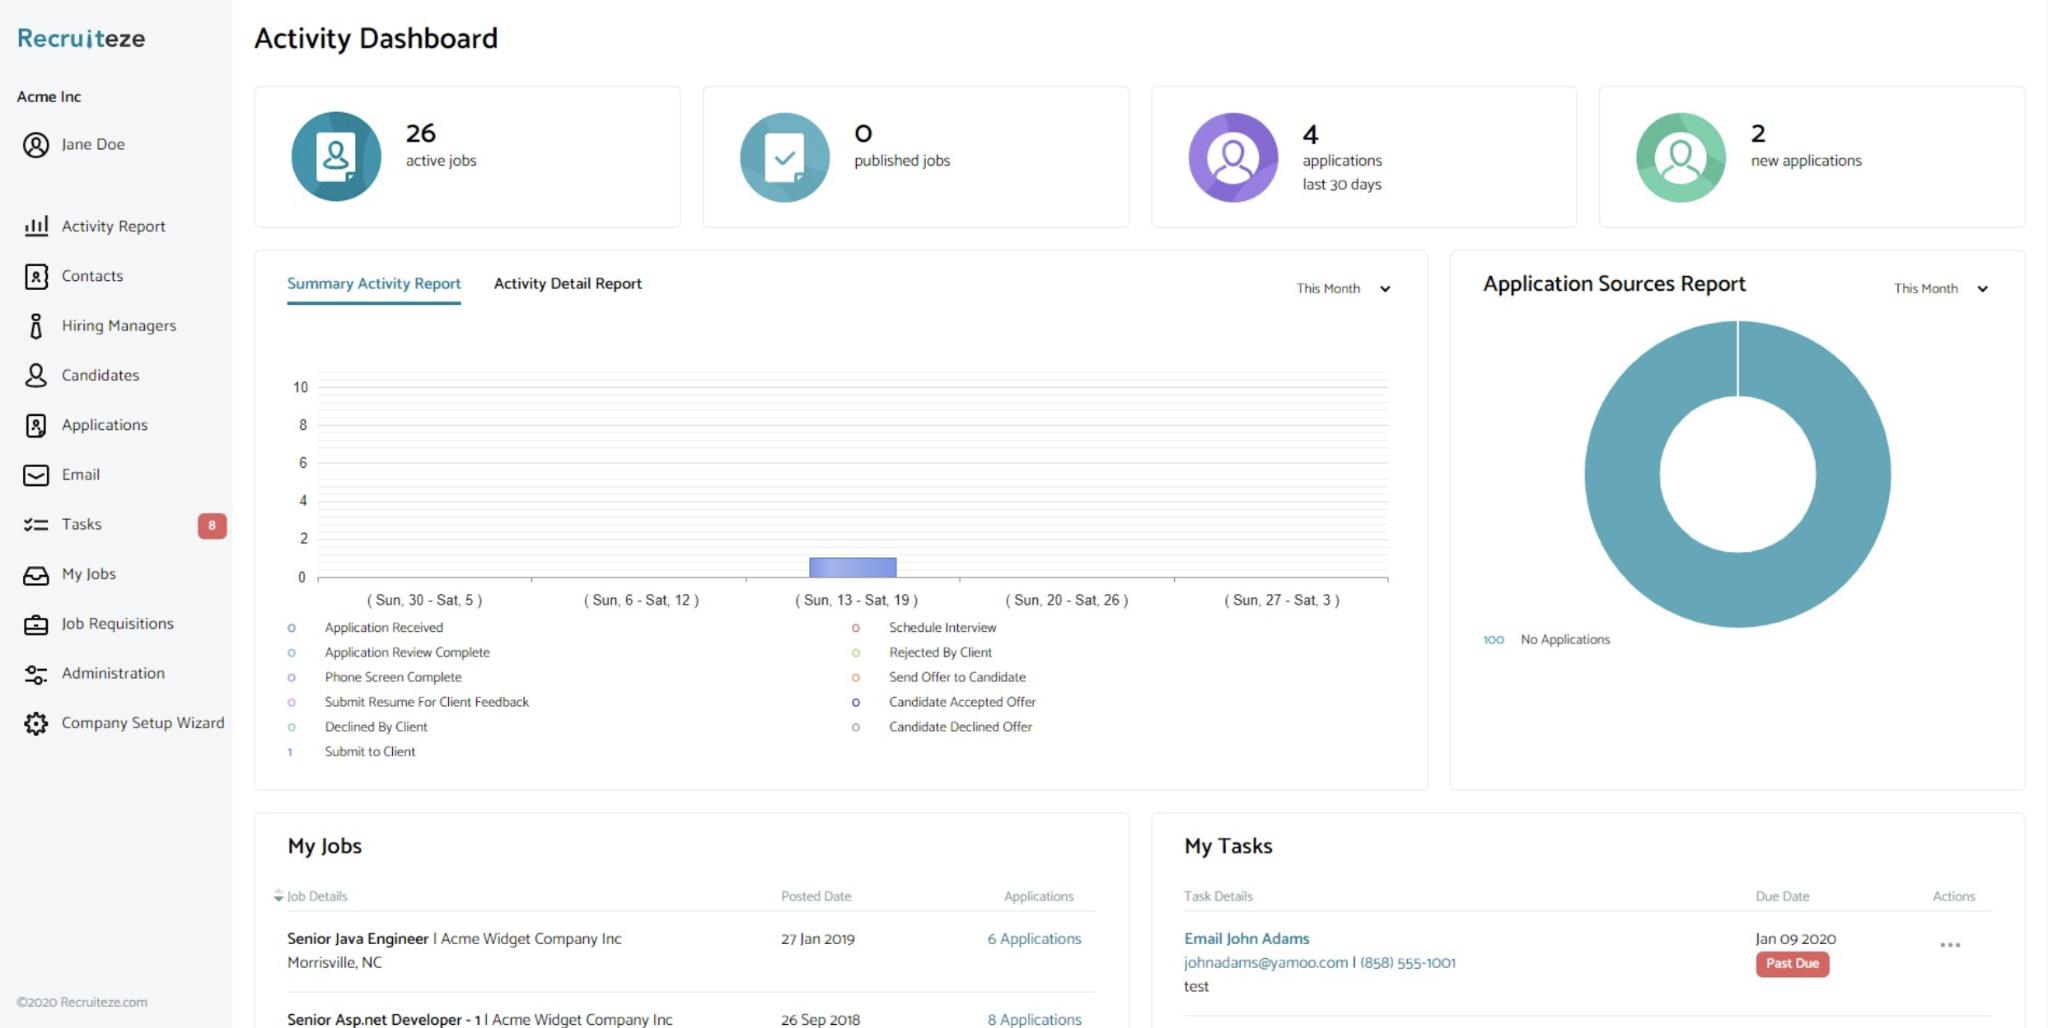 Recruiteze has a Intuitive and straightforward UI